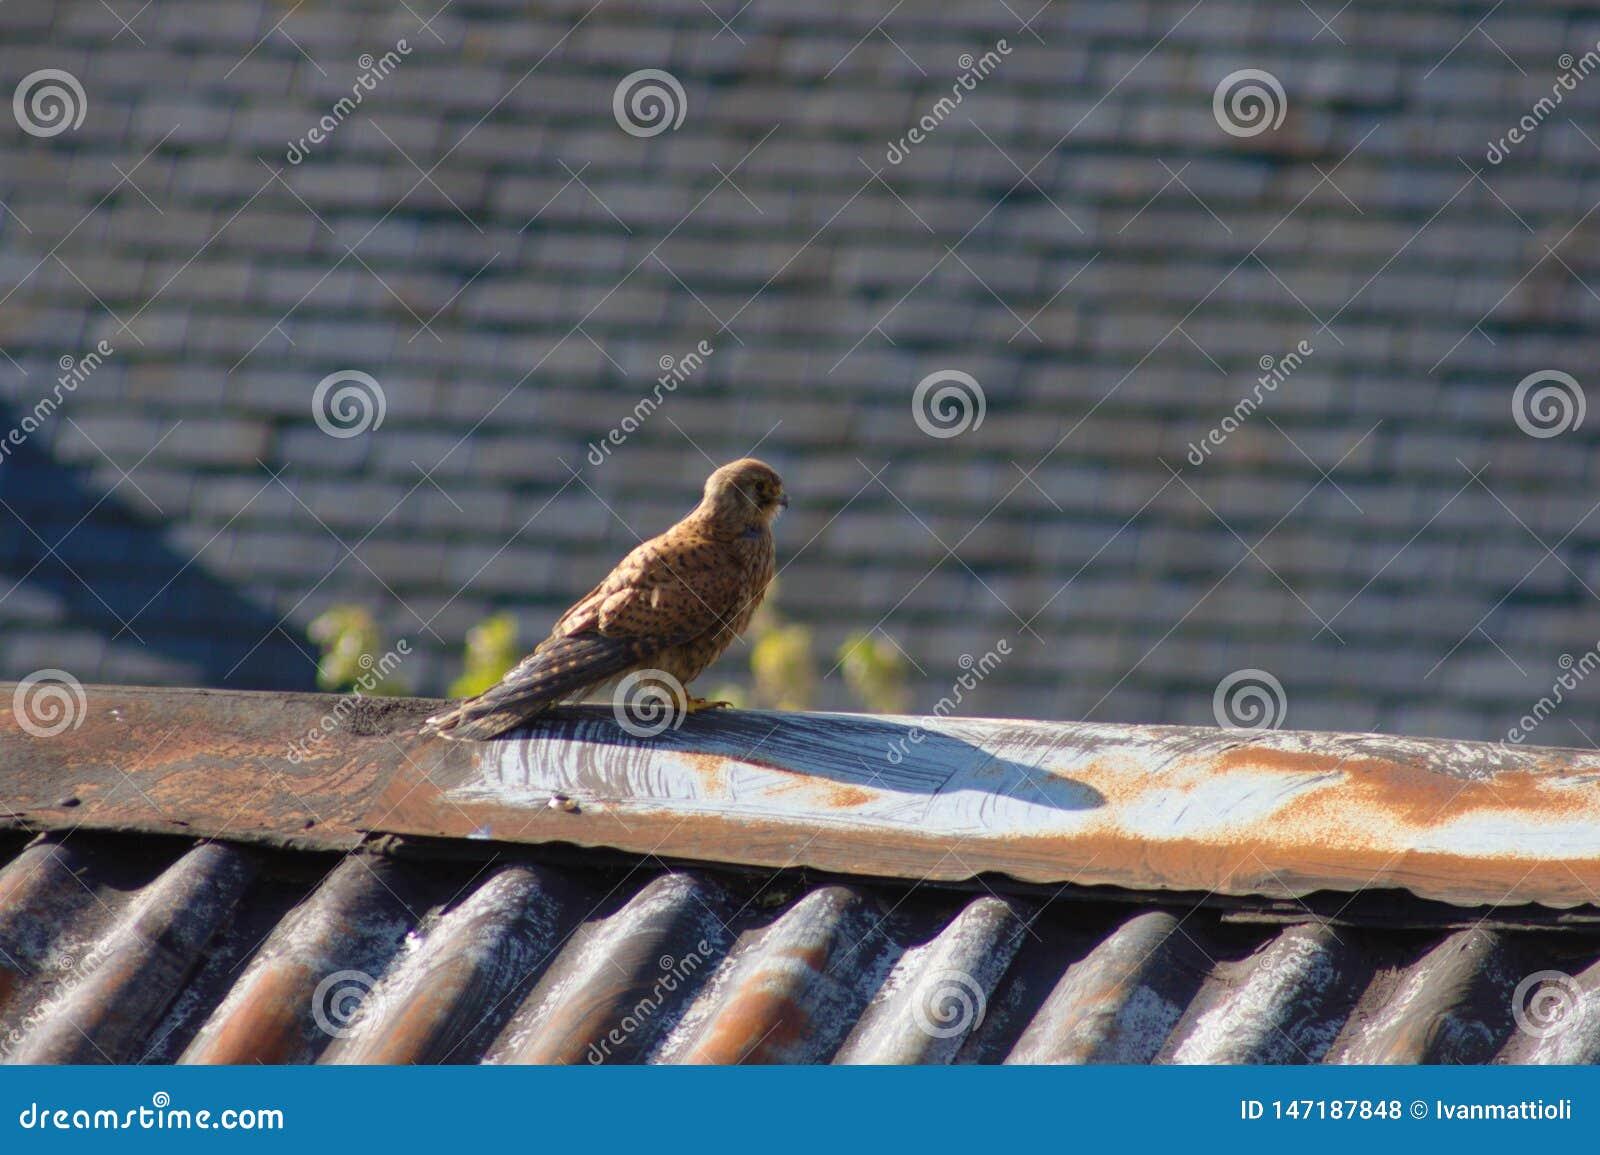 Kestrel on a rooftop. South England, UK